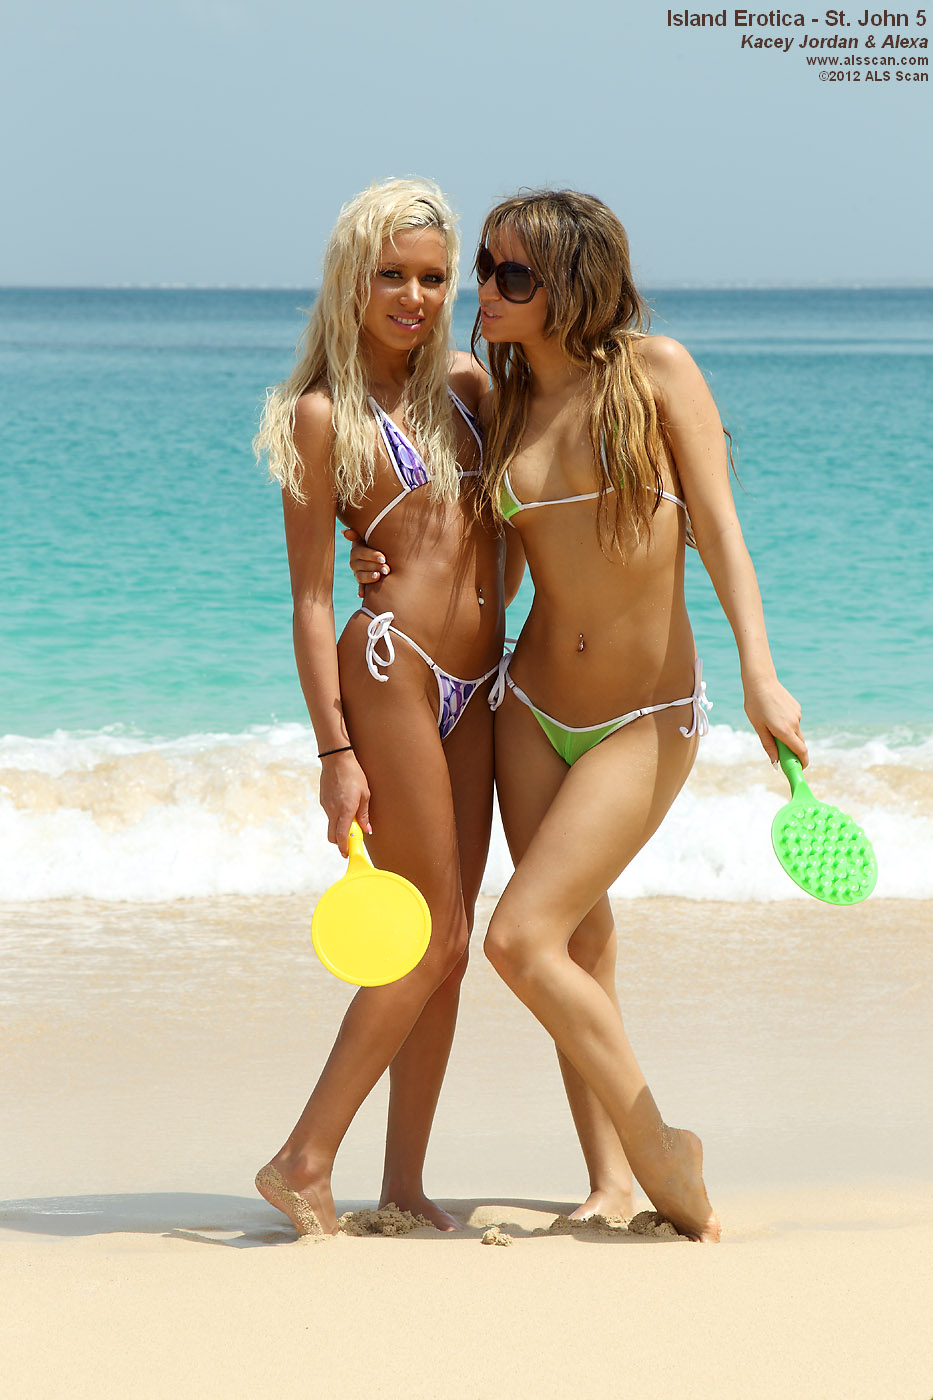 Island Erotica - Pussy Play with Kacey Jordan and Alexa on a Beach in the Caribbean